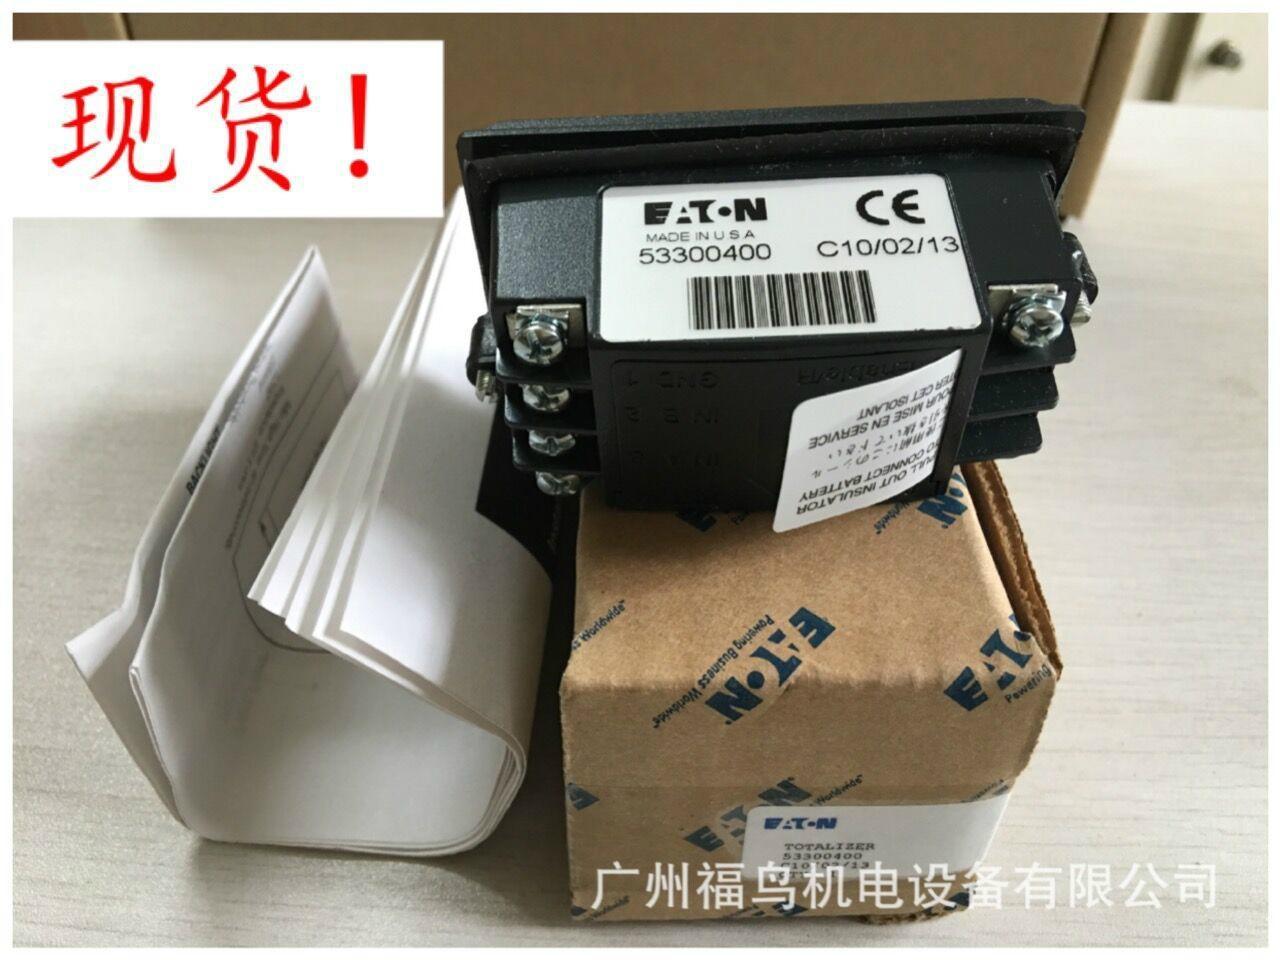 DURANT/EATON計數器, 型號: 53300400